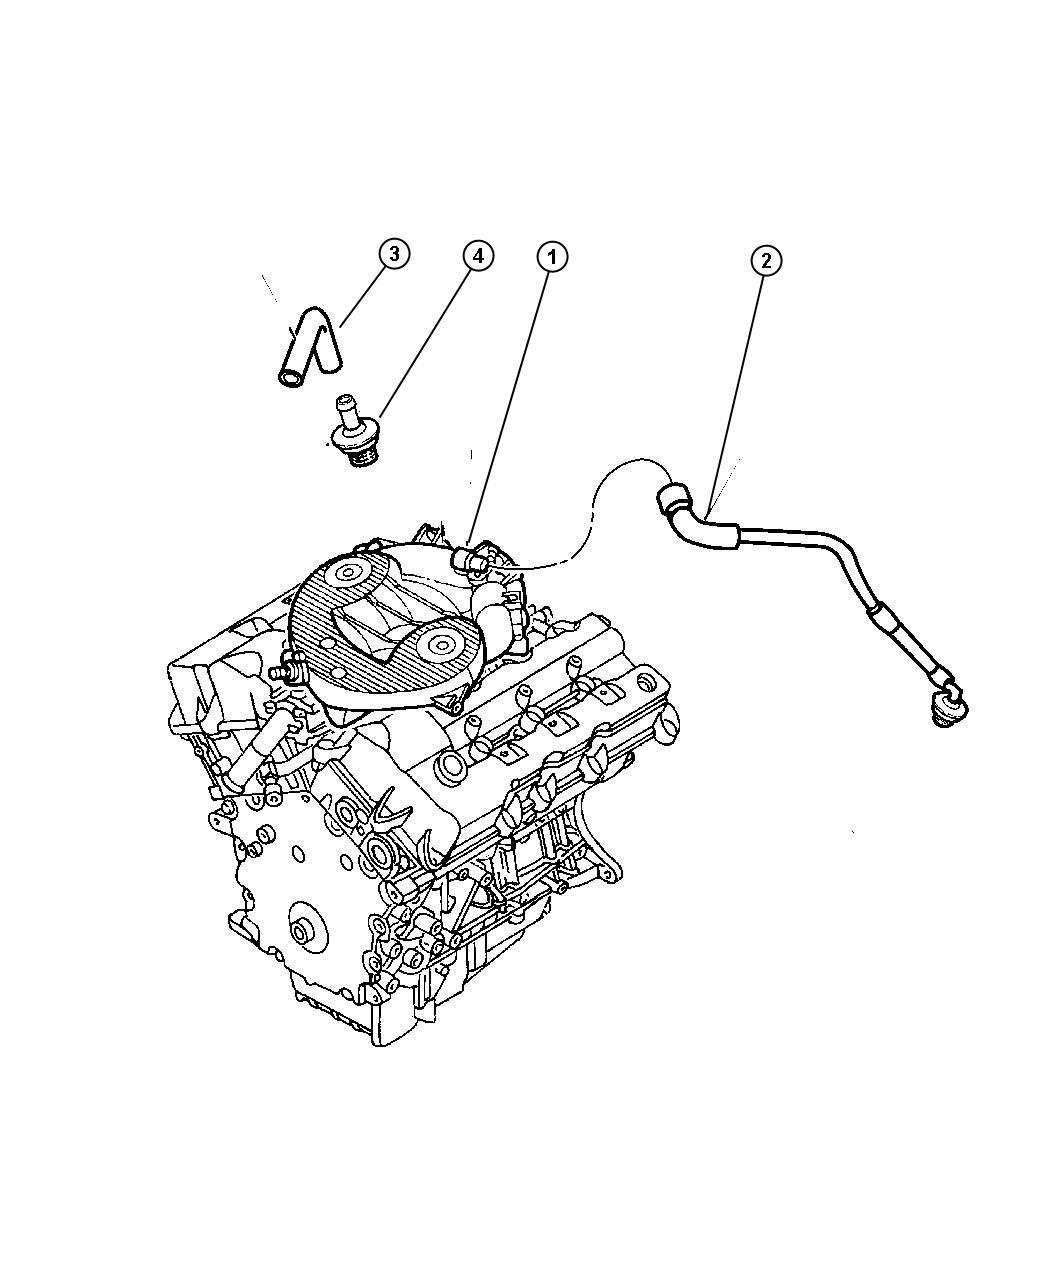 Dodge Viper Hose Cylinder Head To Intake Man Engine